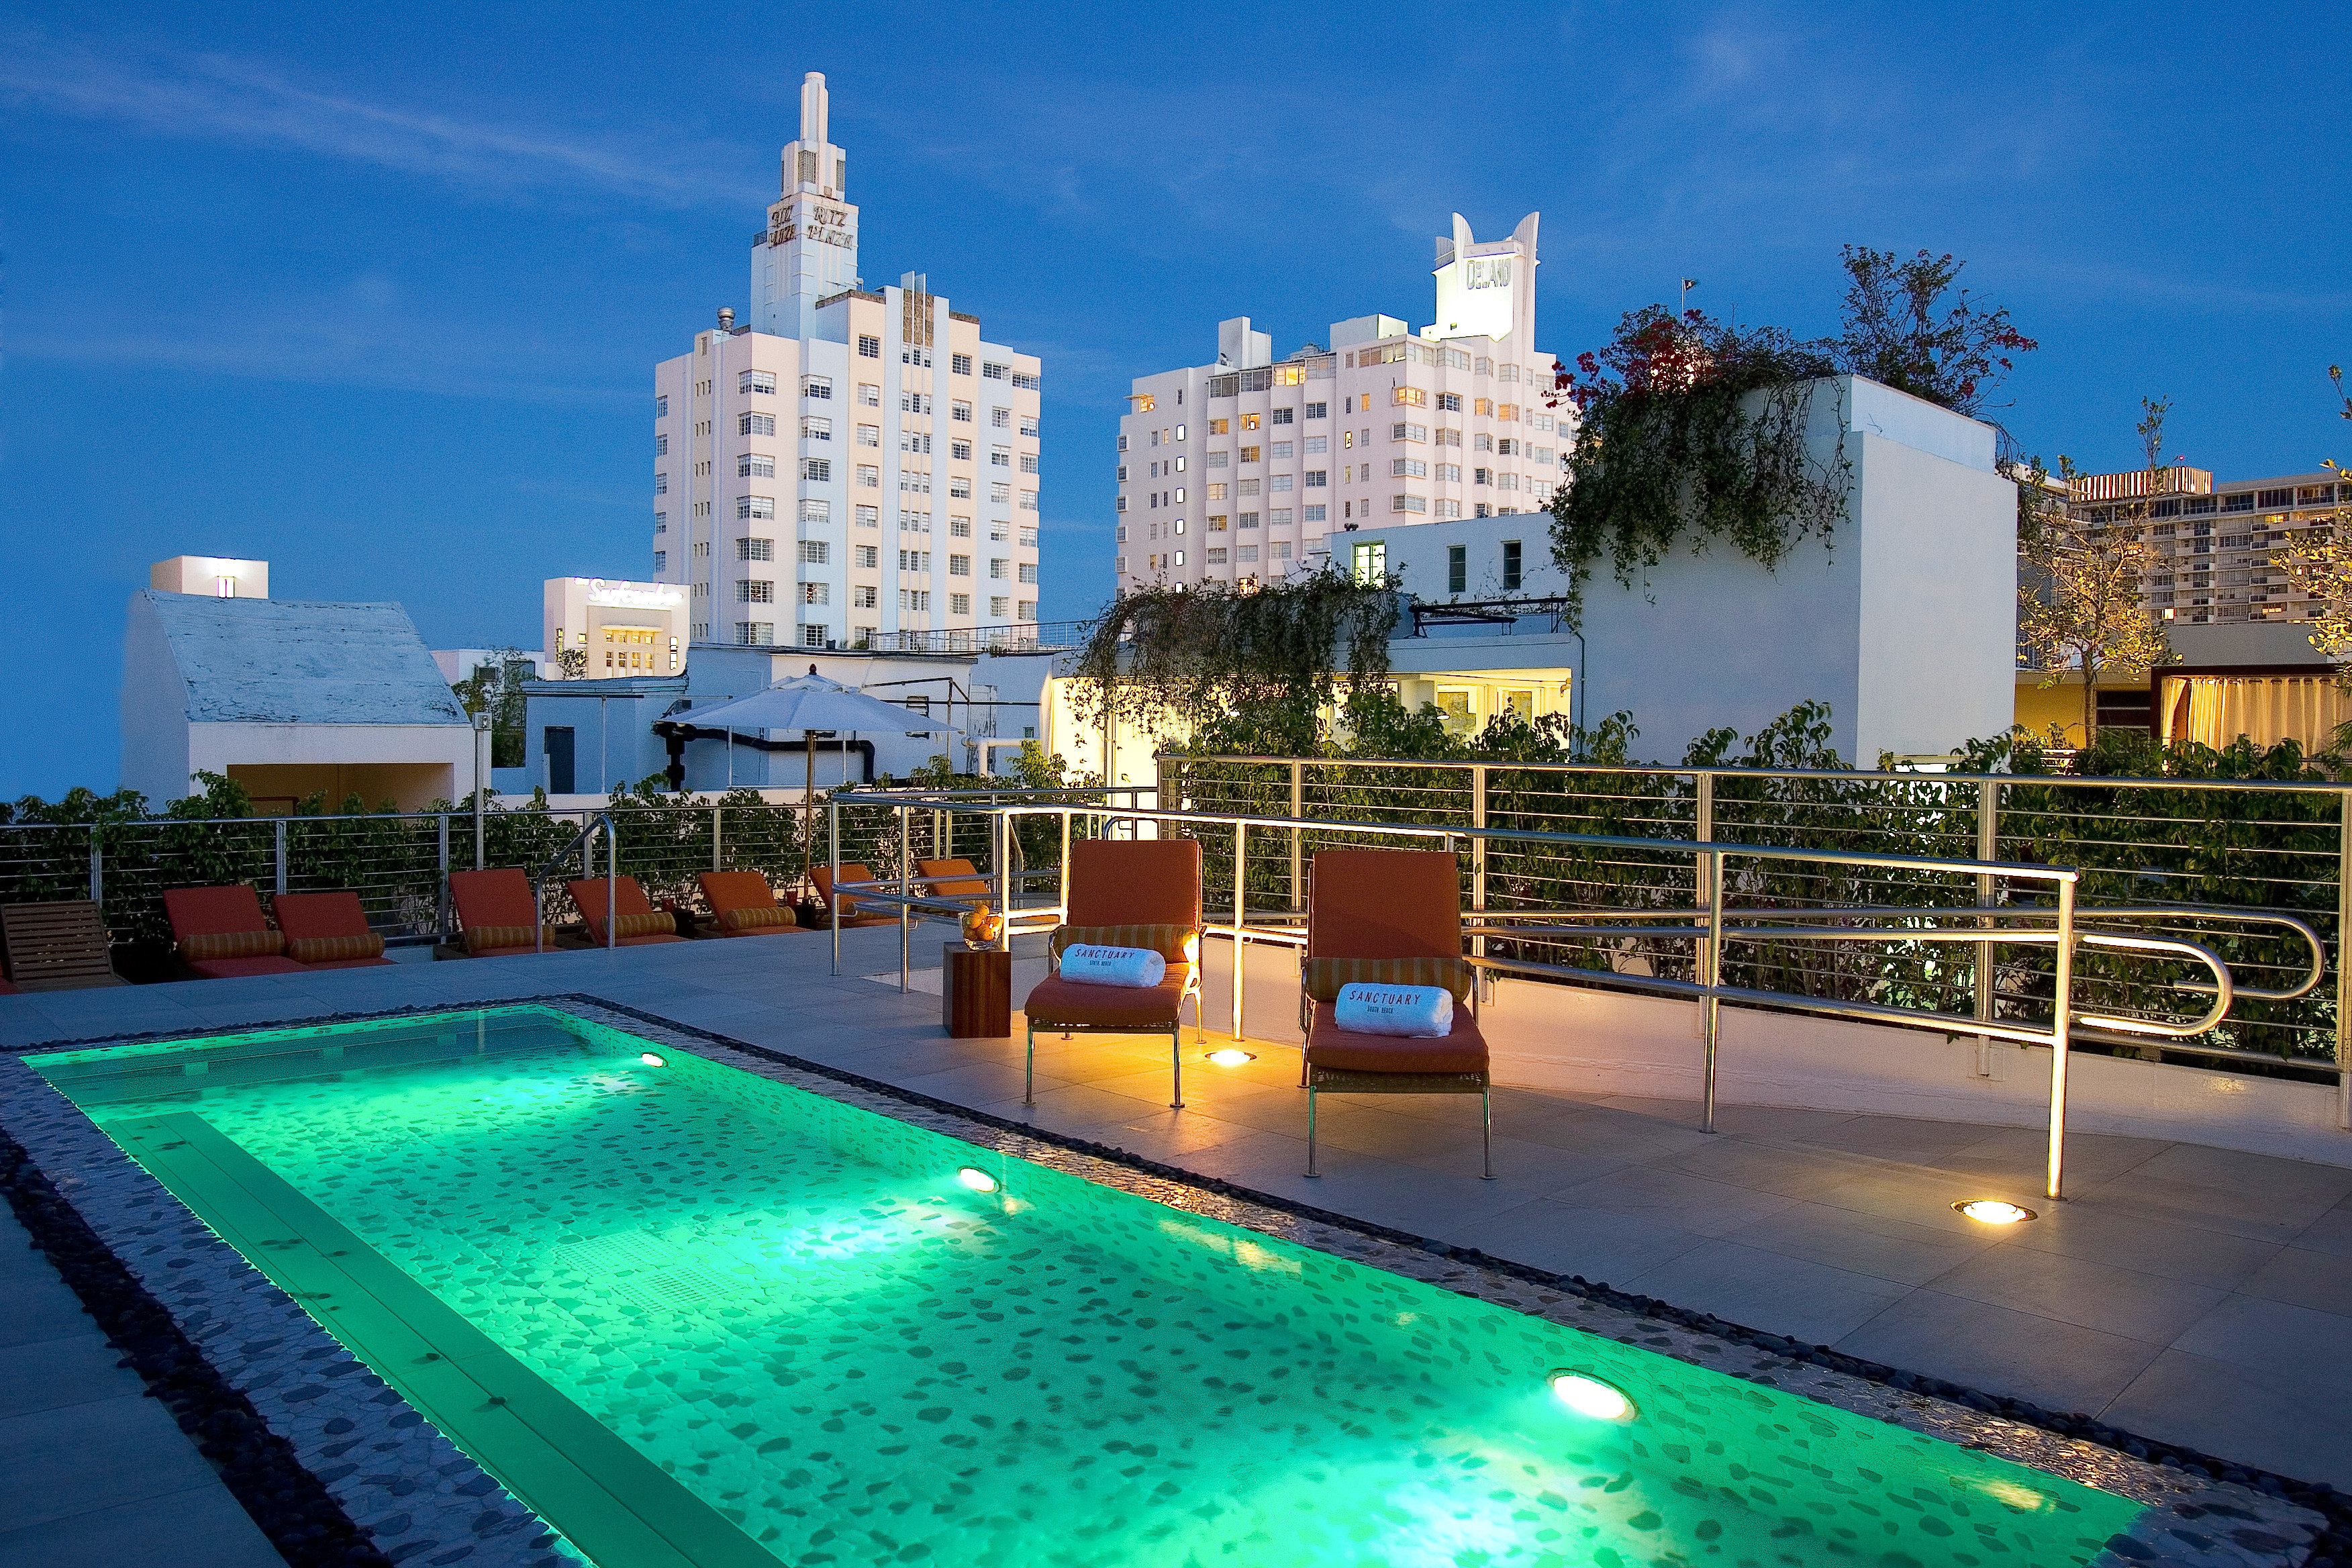 City Lounge Luxury Modern Pool sky swimming pool property leisure condominium Resort reflecting pool swimming